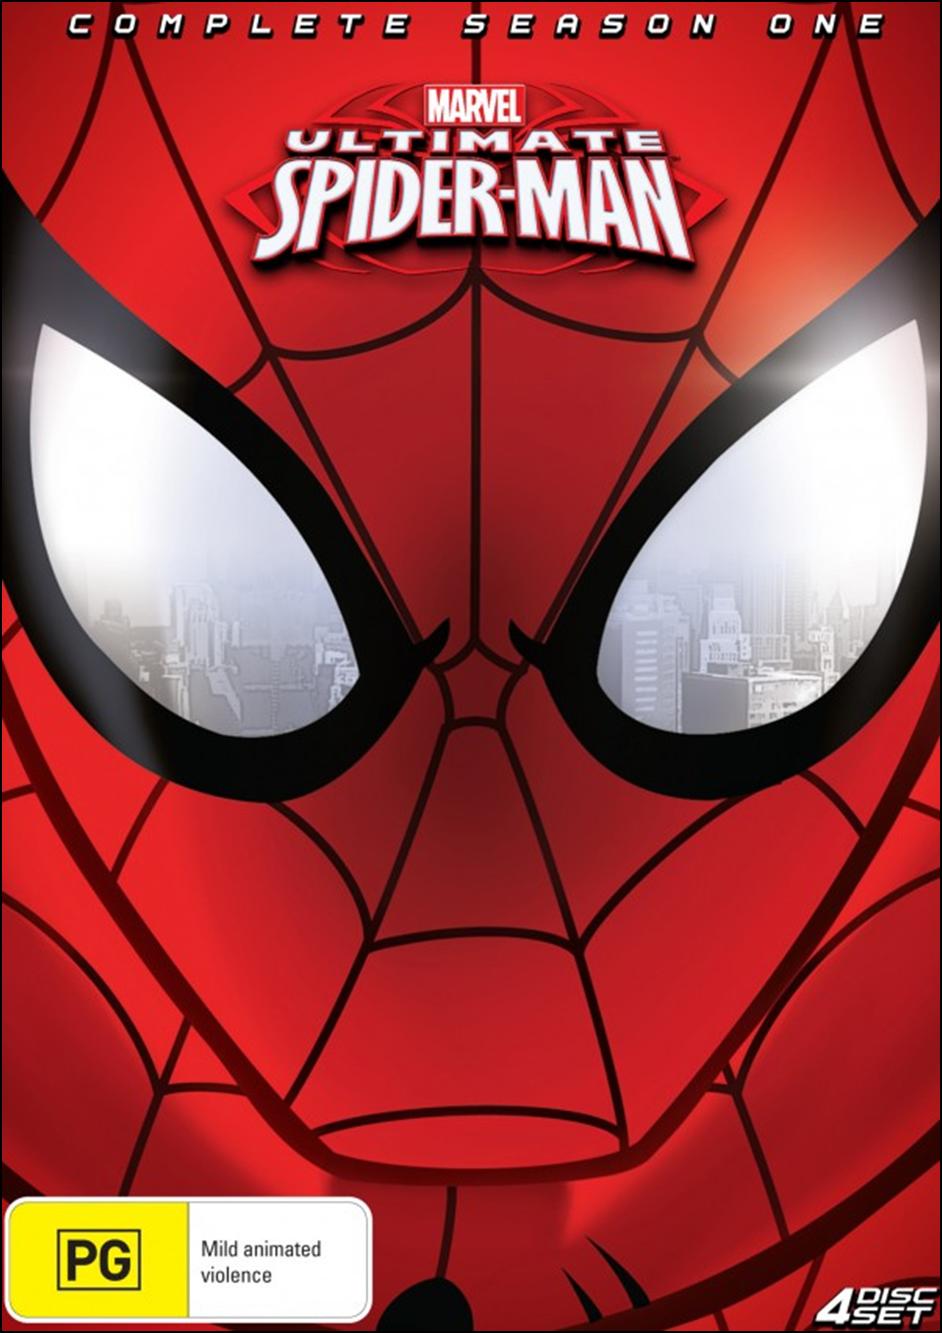 Amazing Spider-Man #1 - Exclusive Variant - Clayton Crain